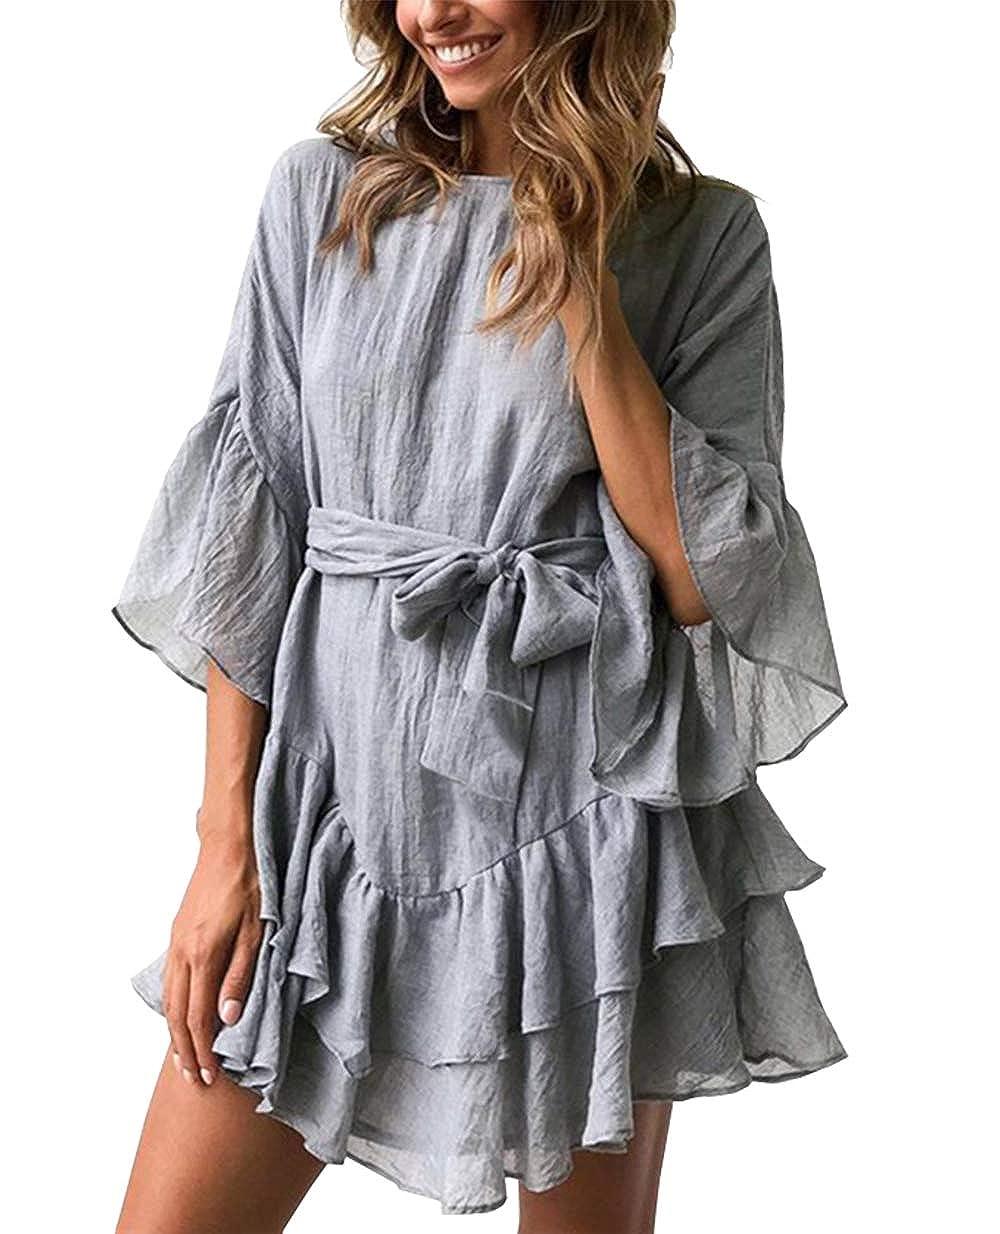 a7af99de1dd PRETTYGARDEN Women s Casual Solid Color O-Neck 3 4 Bell Sleeve Ruffle Swing  A Line Mini Dress Sundress with Belt